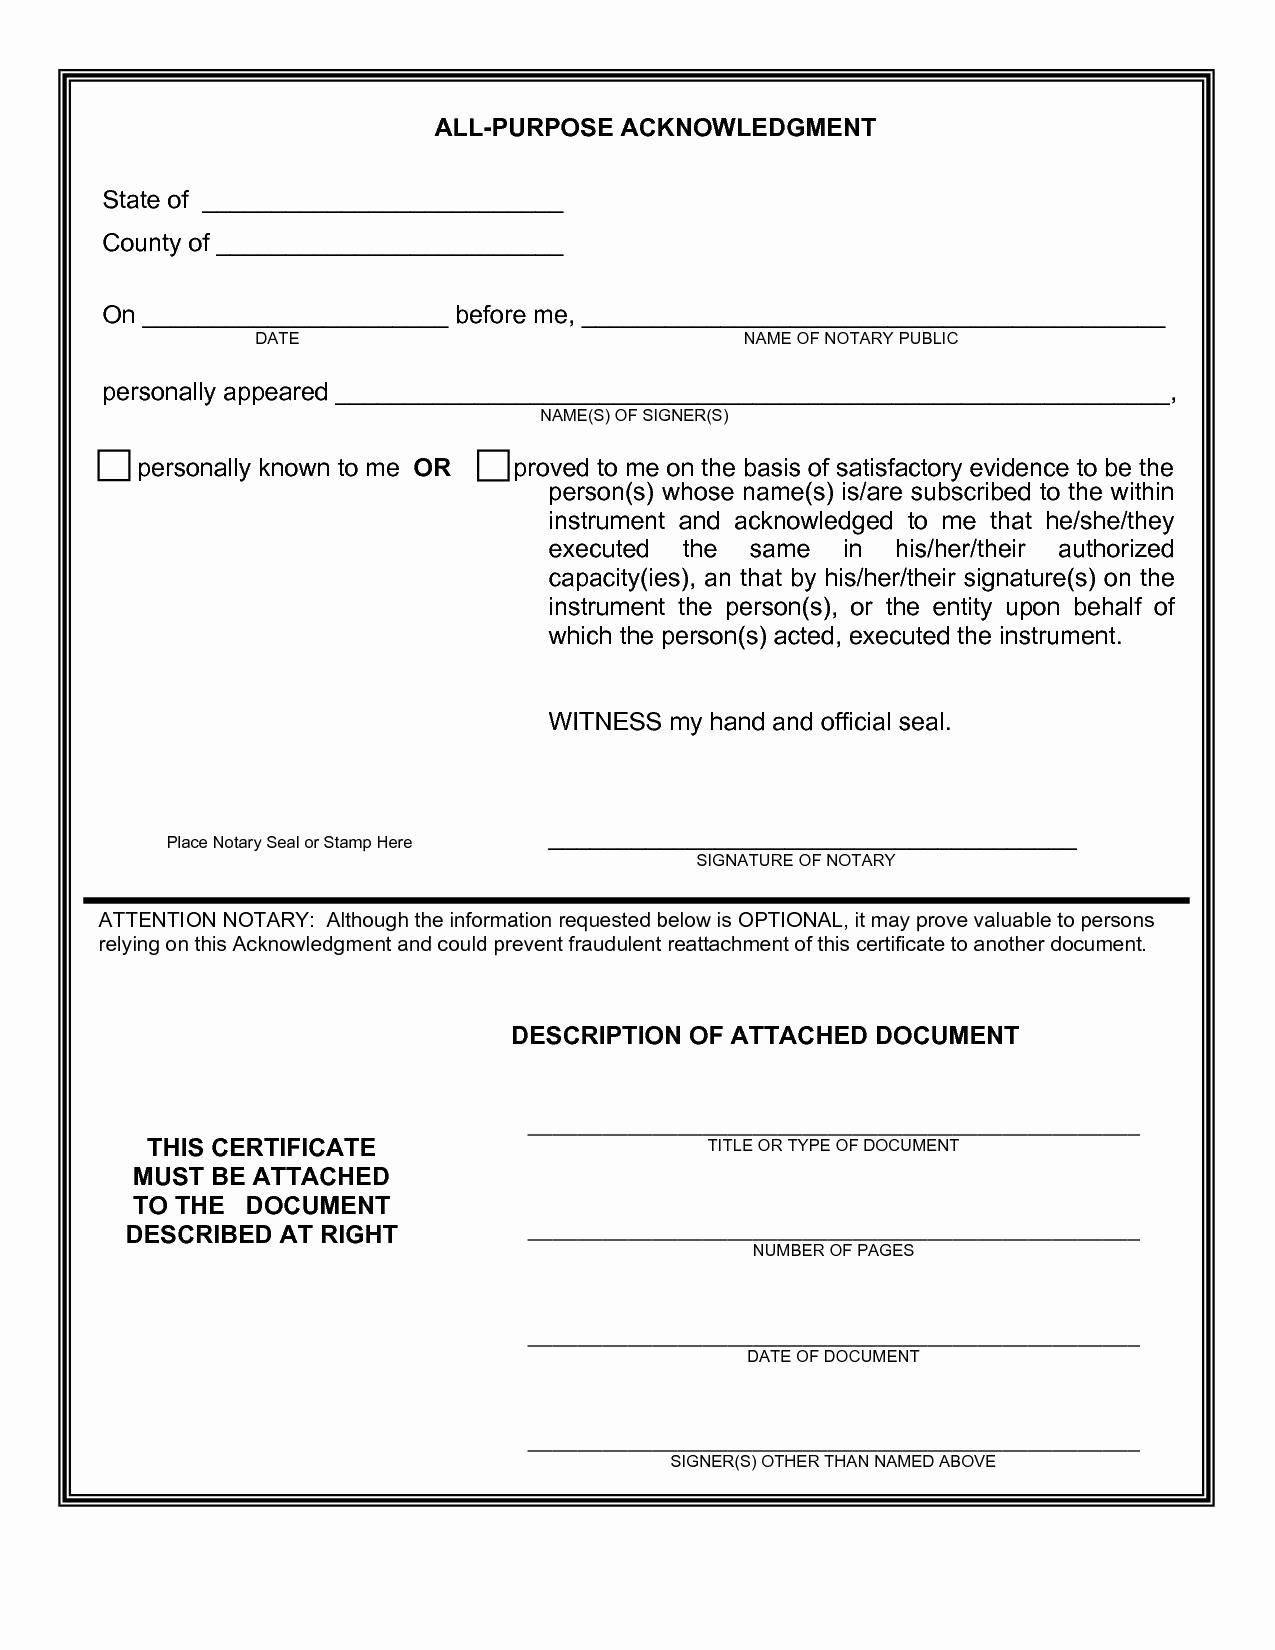 Notary Public Signature Line Template Inspirational Notary Affidavit Examples Public Statement Sample Virginia